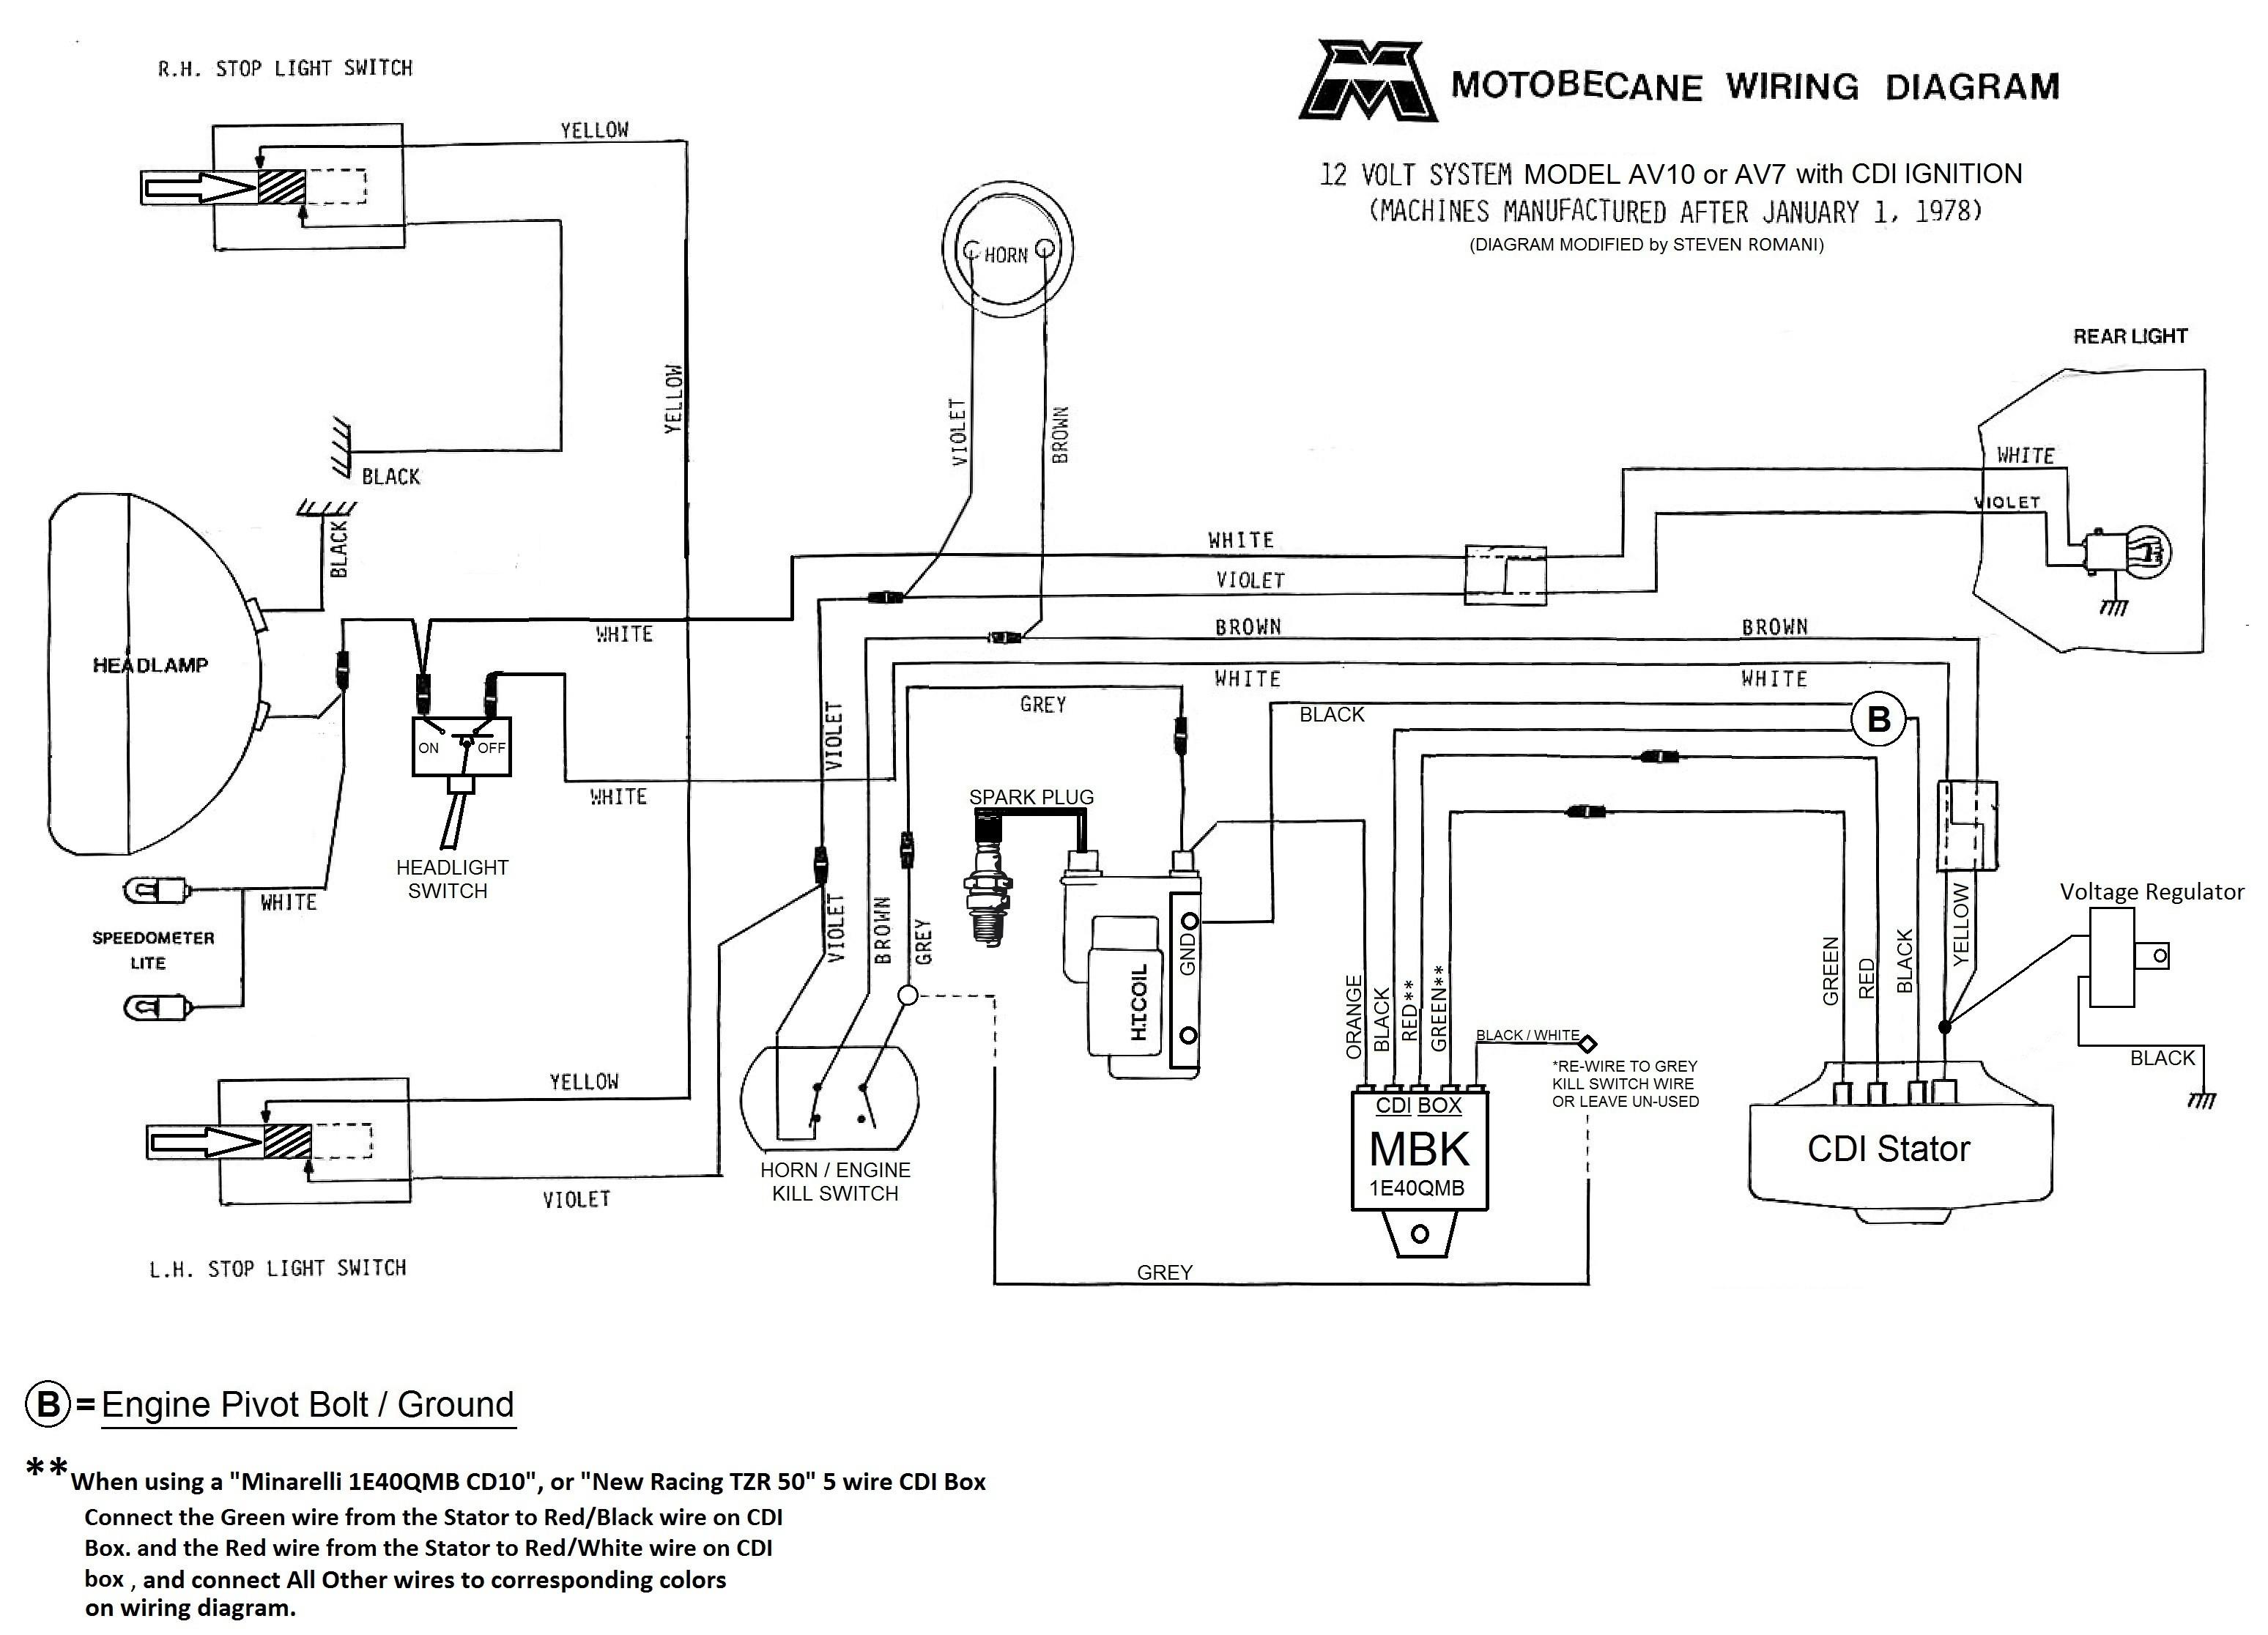 Maxxforce 13 Engine Sensor Harness Diagram Diagram] Wj Wiring Diagram Full Version Hd Quality Wiring Of Maxxforce 13 Engine Sensor Harness Diagram